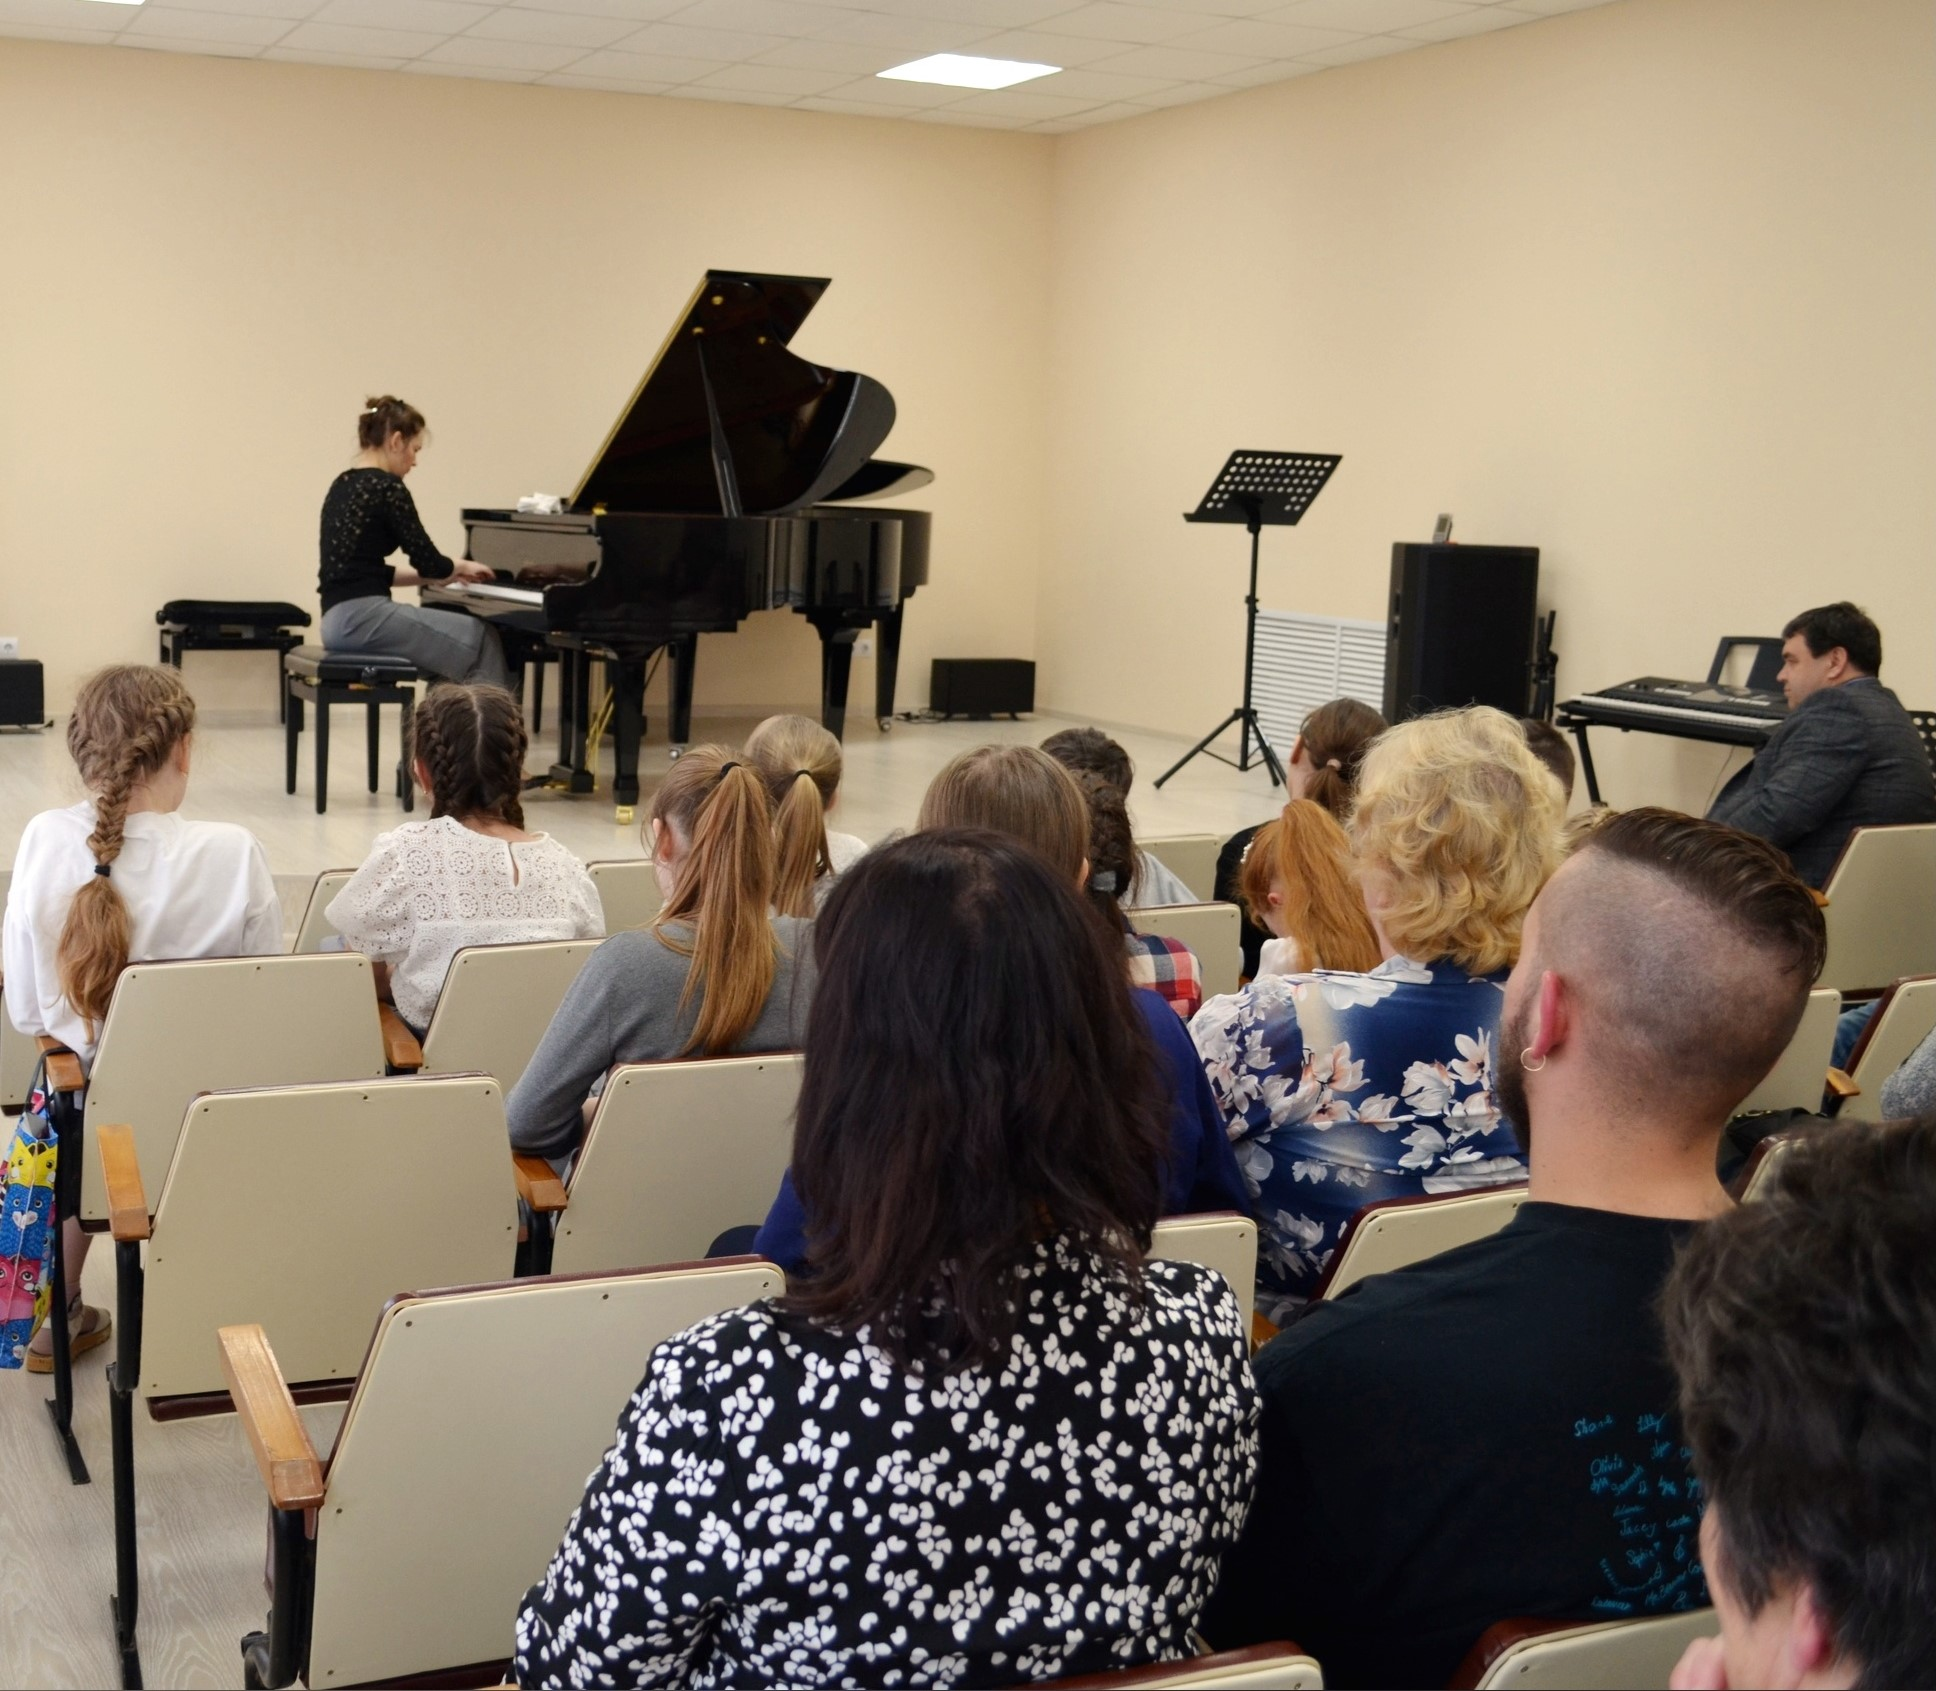 The concert at Liadov Arts&Music School